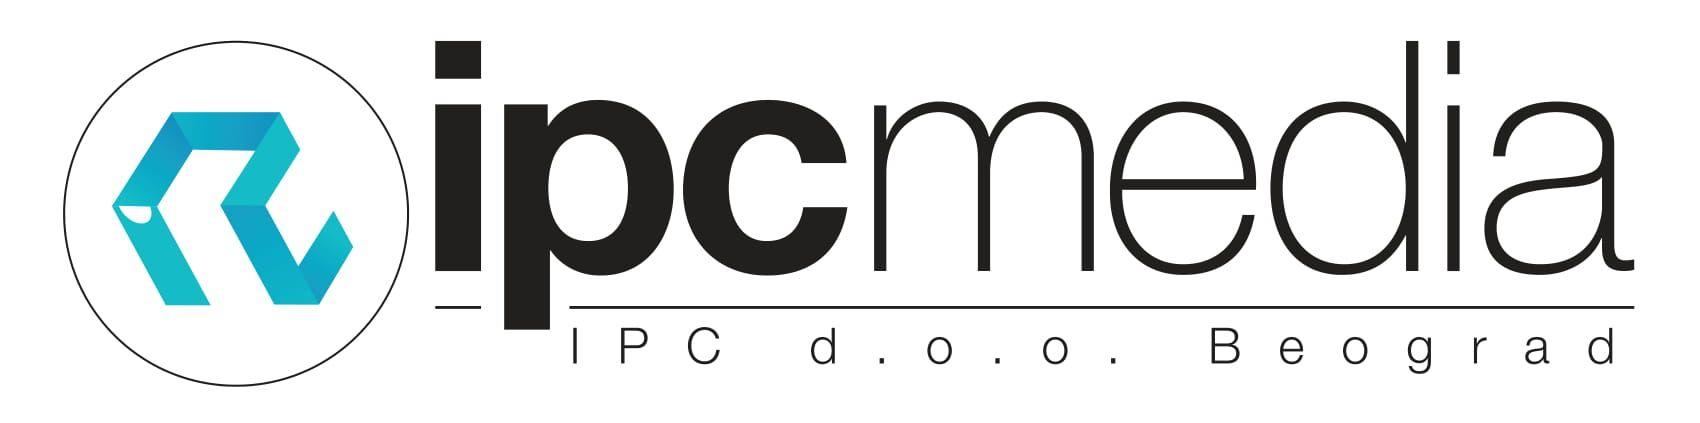 IPC Media, u sastavu IPC d.o.o. Beograd